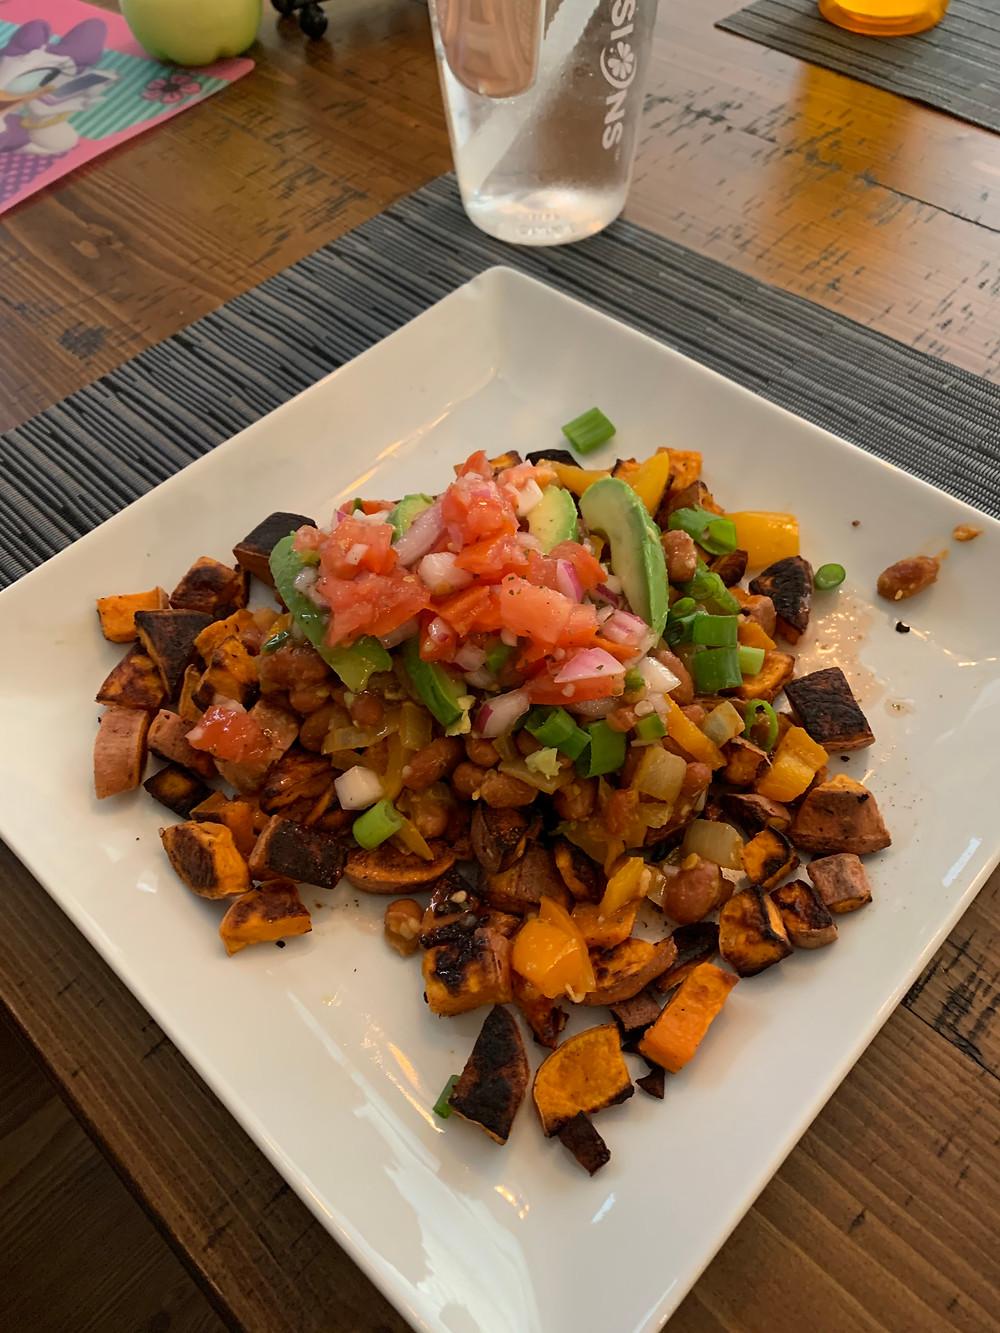 Homemade Sweet Potato Dish